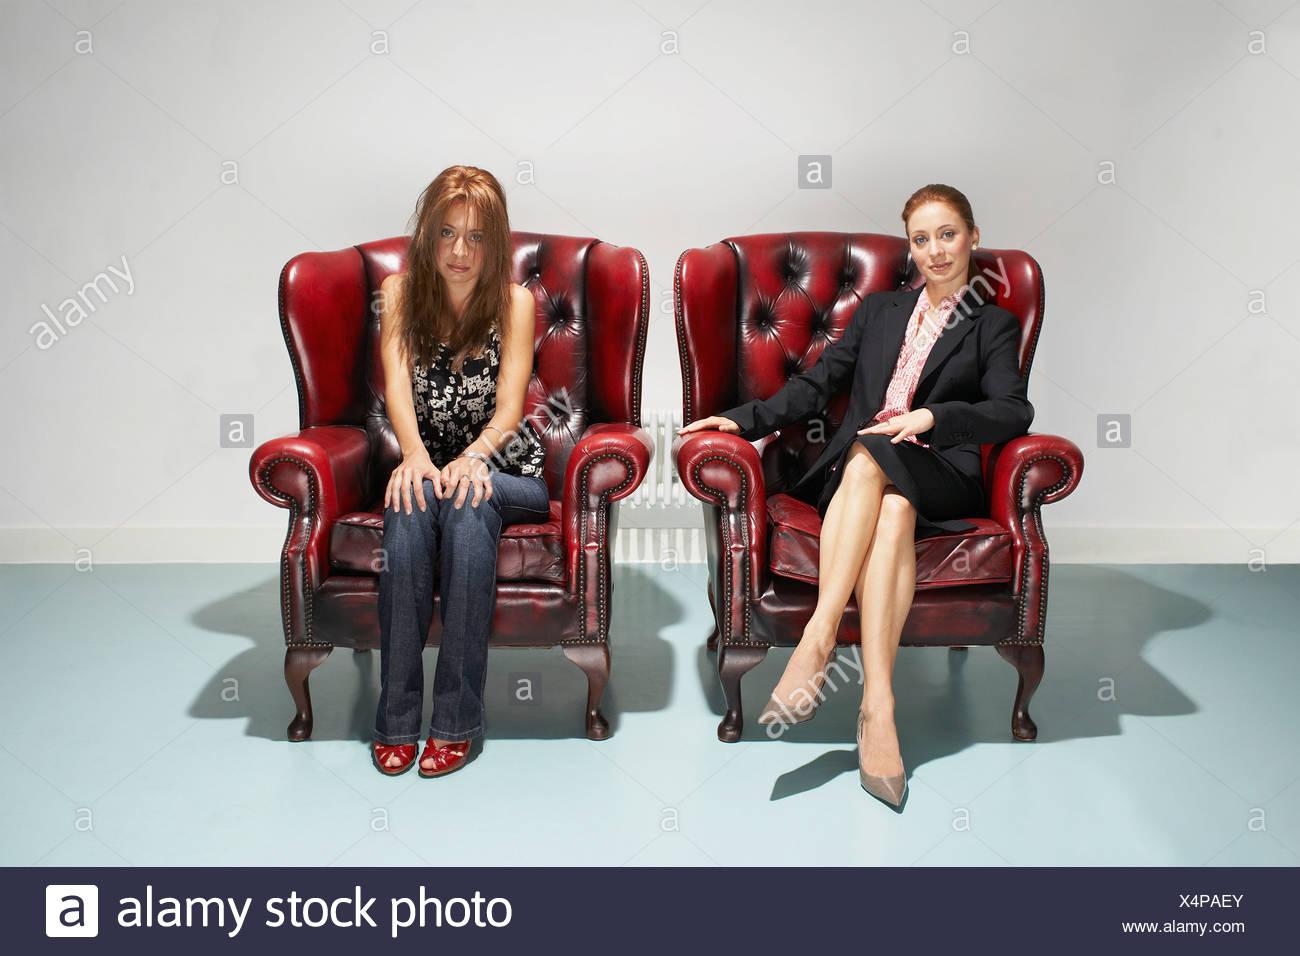 Imprenditrice e donna disheveled in comode poltrone in pelle Immagini Stock